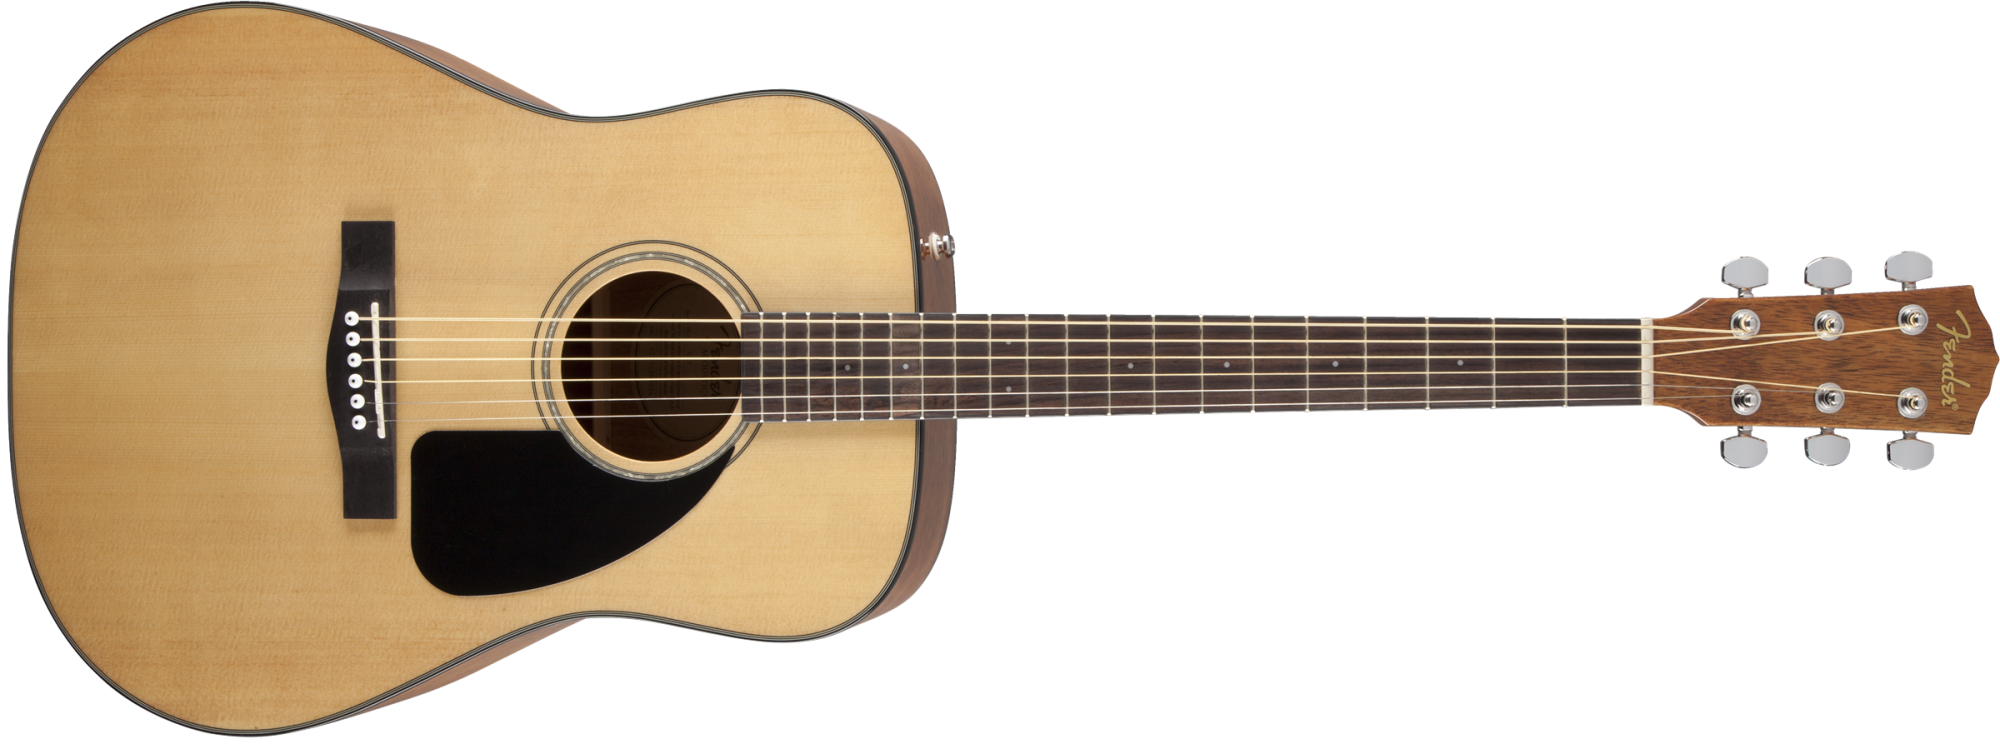 Fender CD-60 Dreadnought V3 w/Hardshell Case, Walnut Fingerboard, Natural